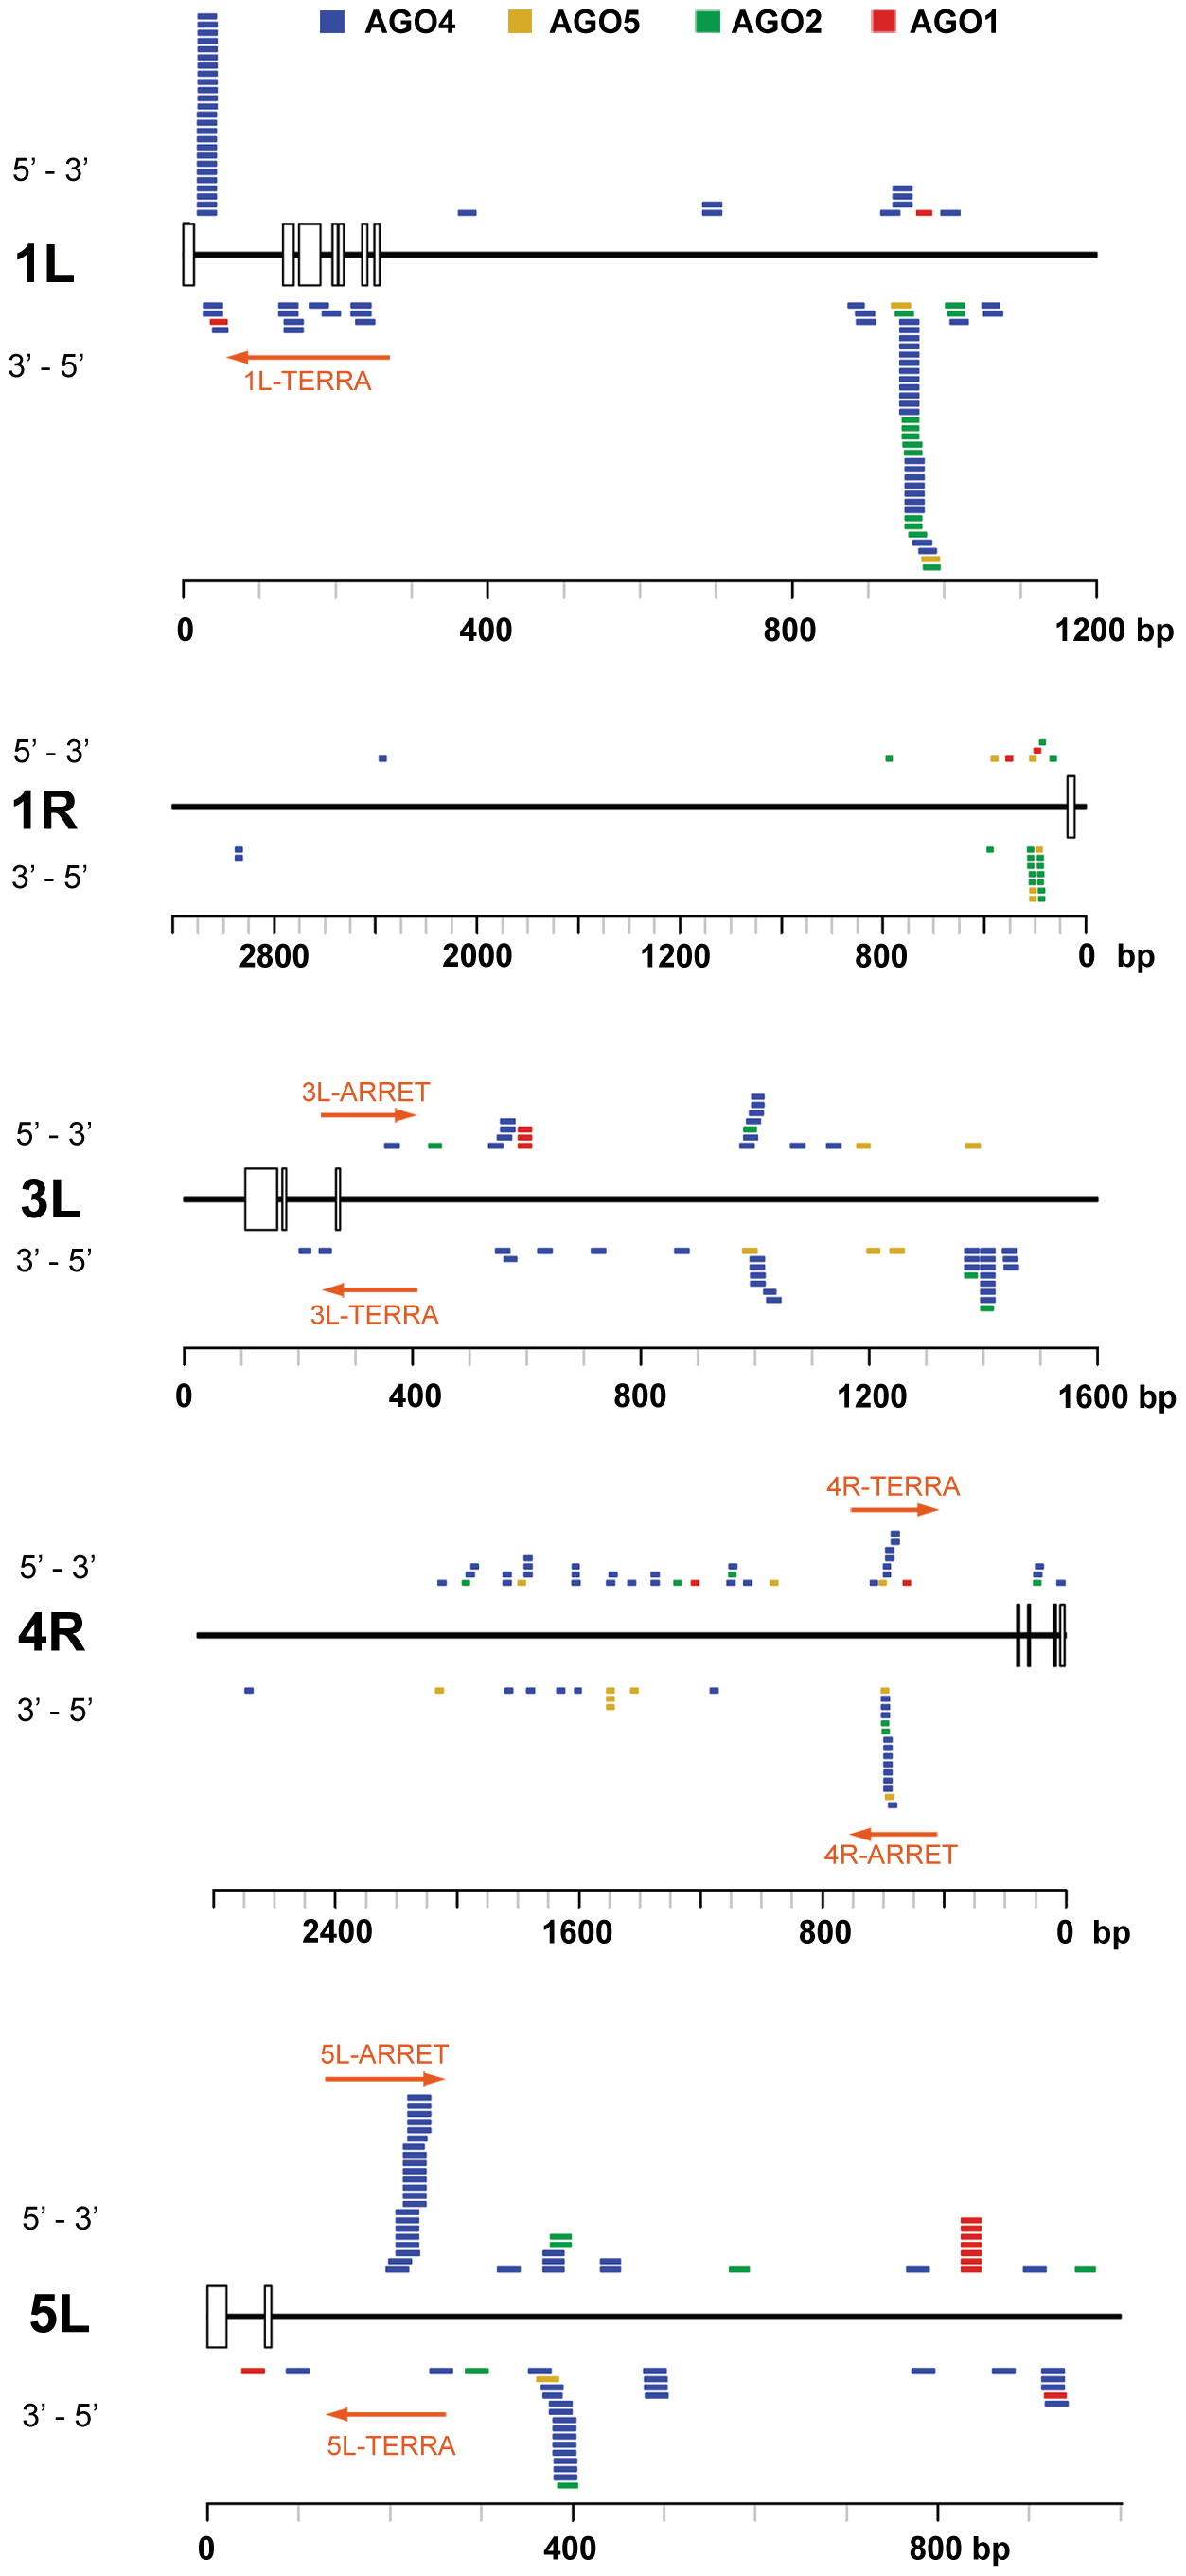 Distribution of Argonaute-associated siRNAs in telomere-adjacent regions.